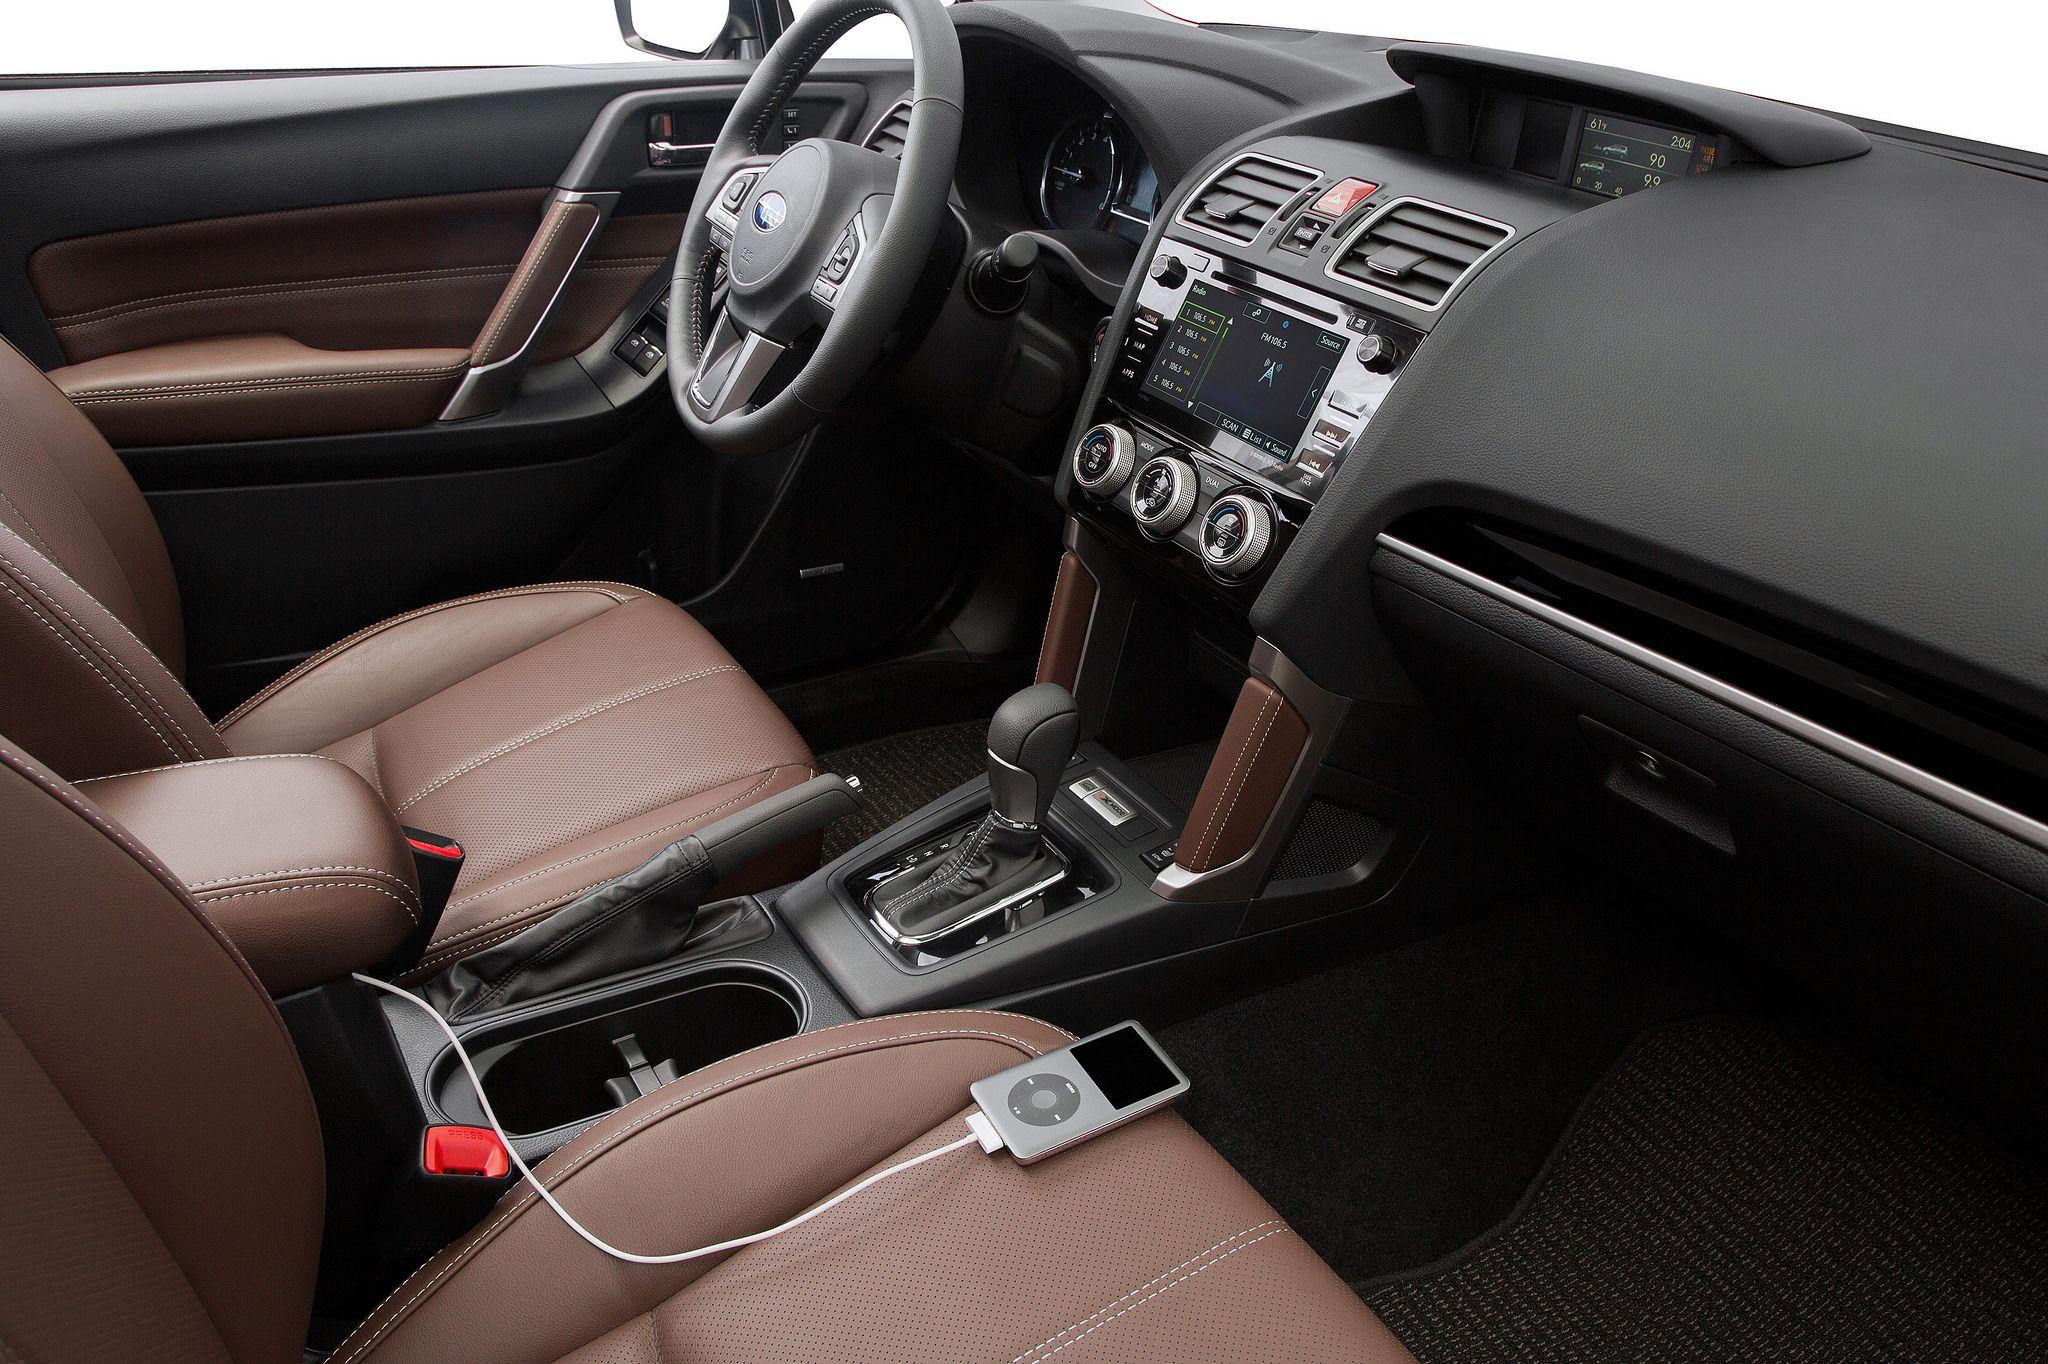 The 2018 Subaru Forester ...